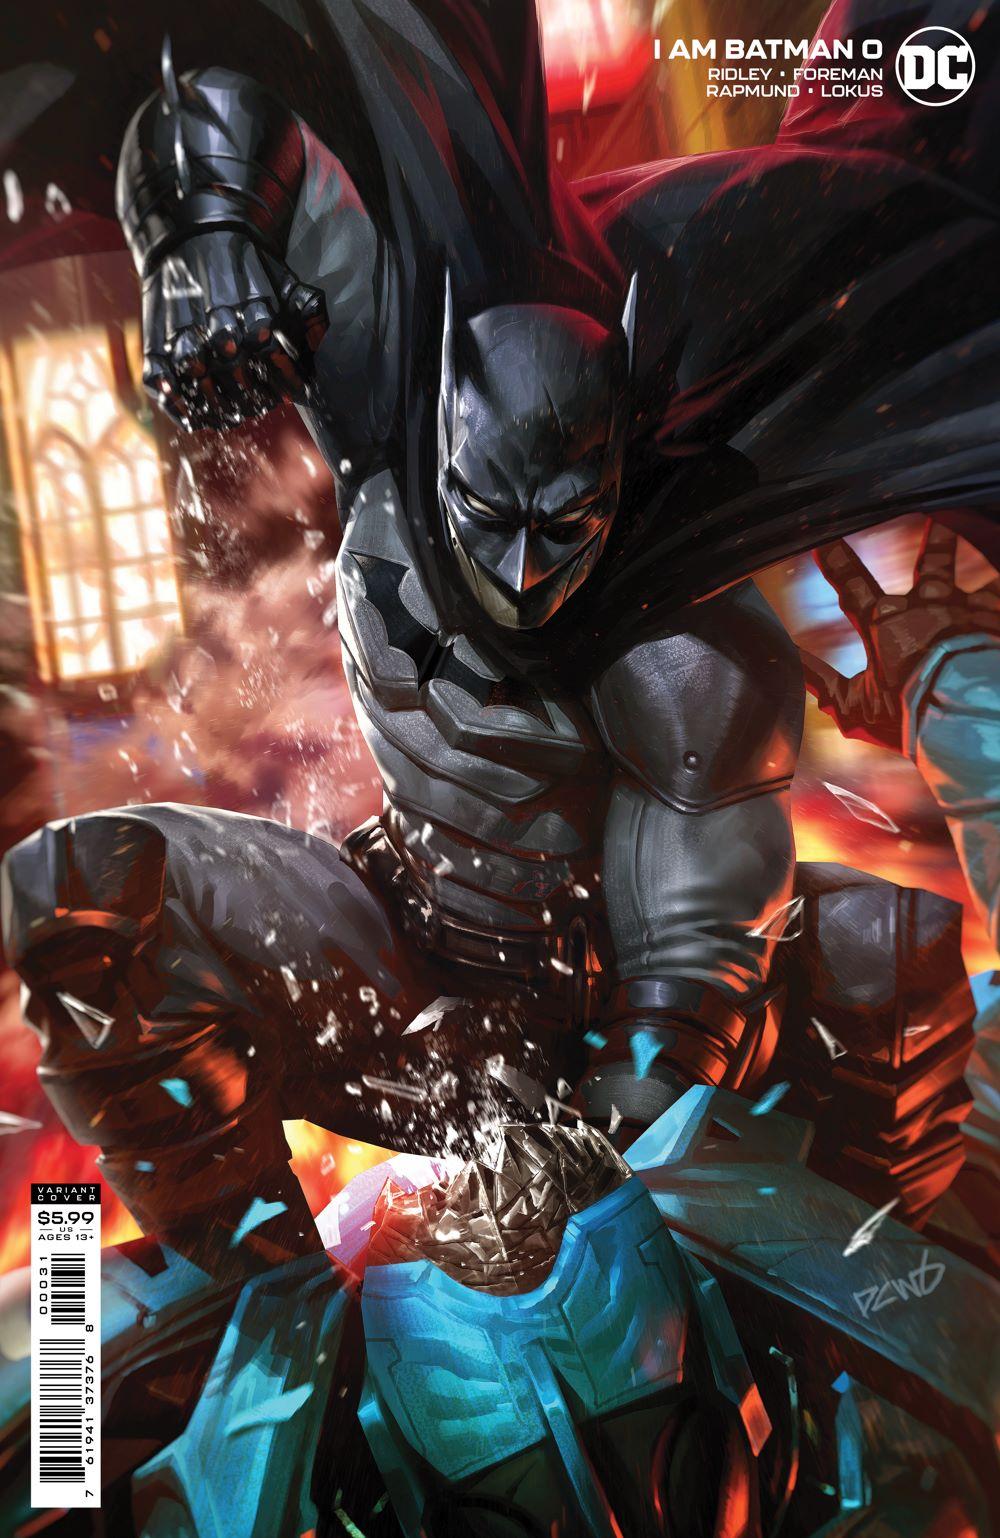 IAMBM_Cv0_var_00031 DC Comics August 2021 Solicitations